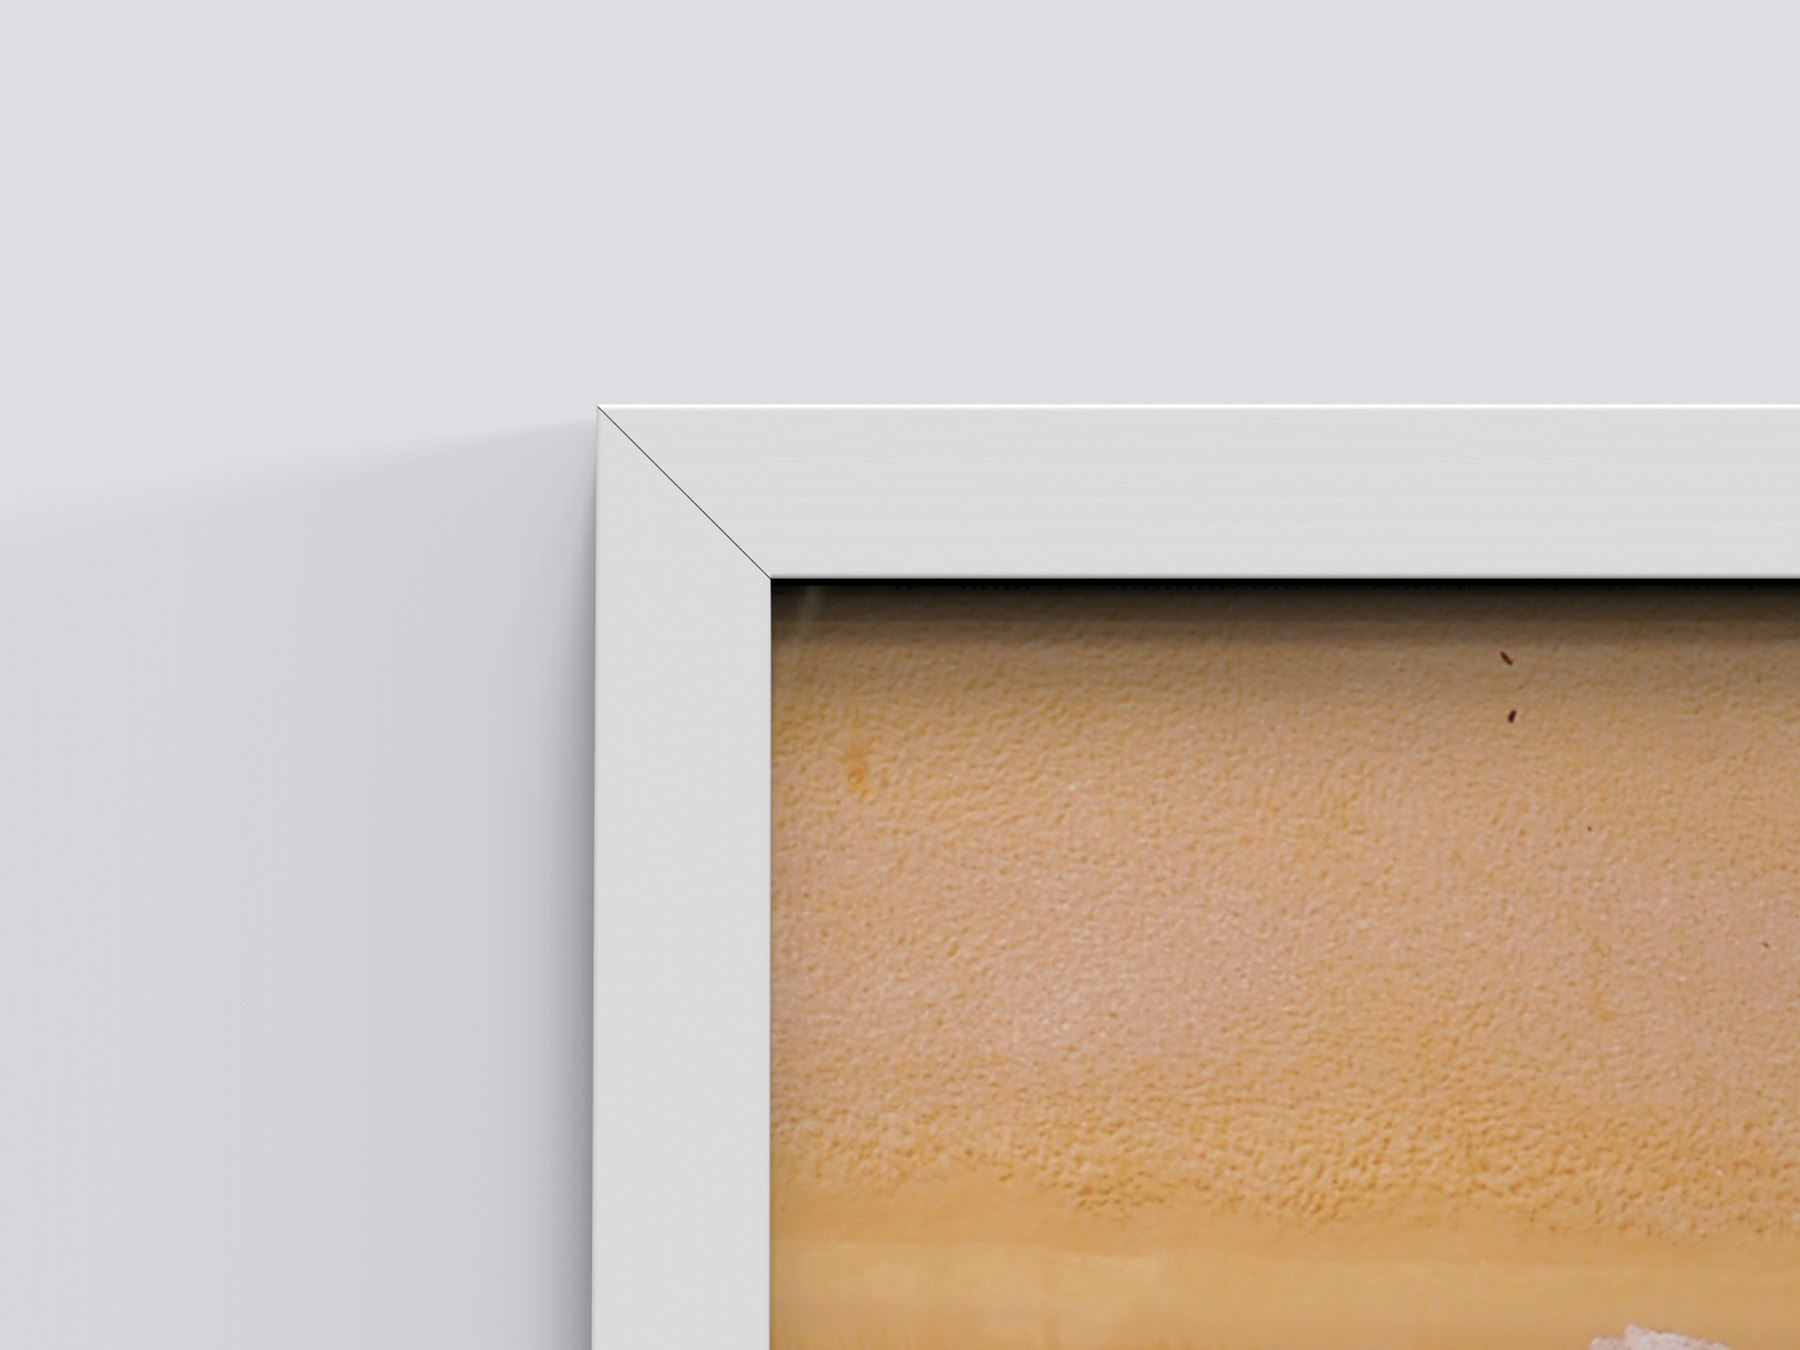 BLACK-WHITE-OAK-PHOTO-PICTURE-FRAME-MAXI-POSTER-FRAMES-LARGE-SQUARE-A1-A2-A3-A4